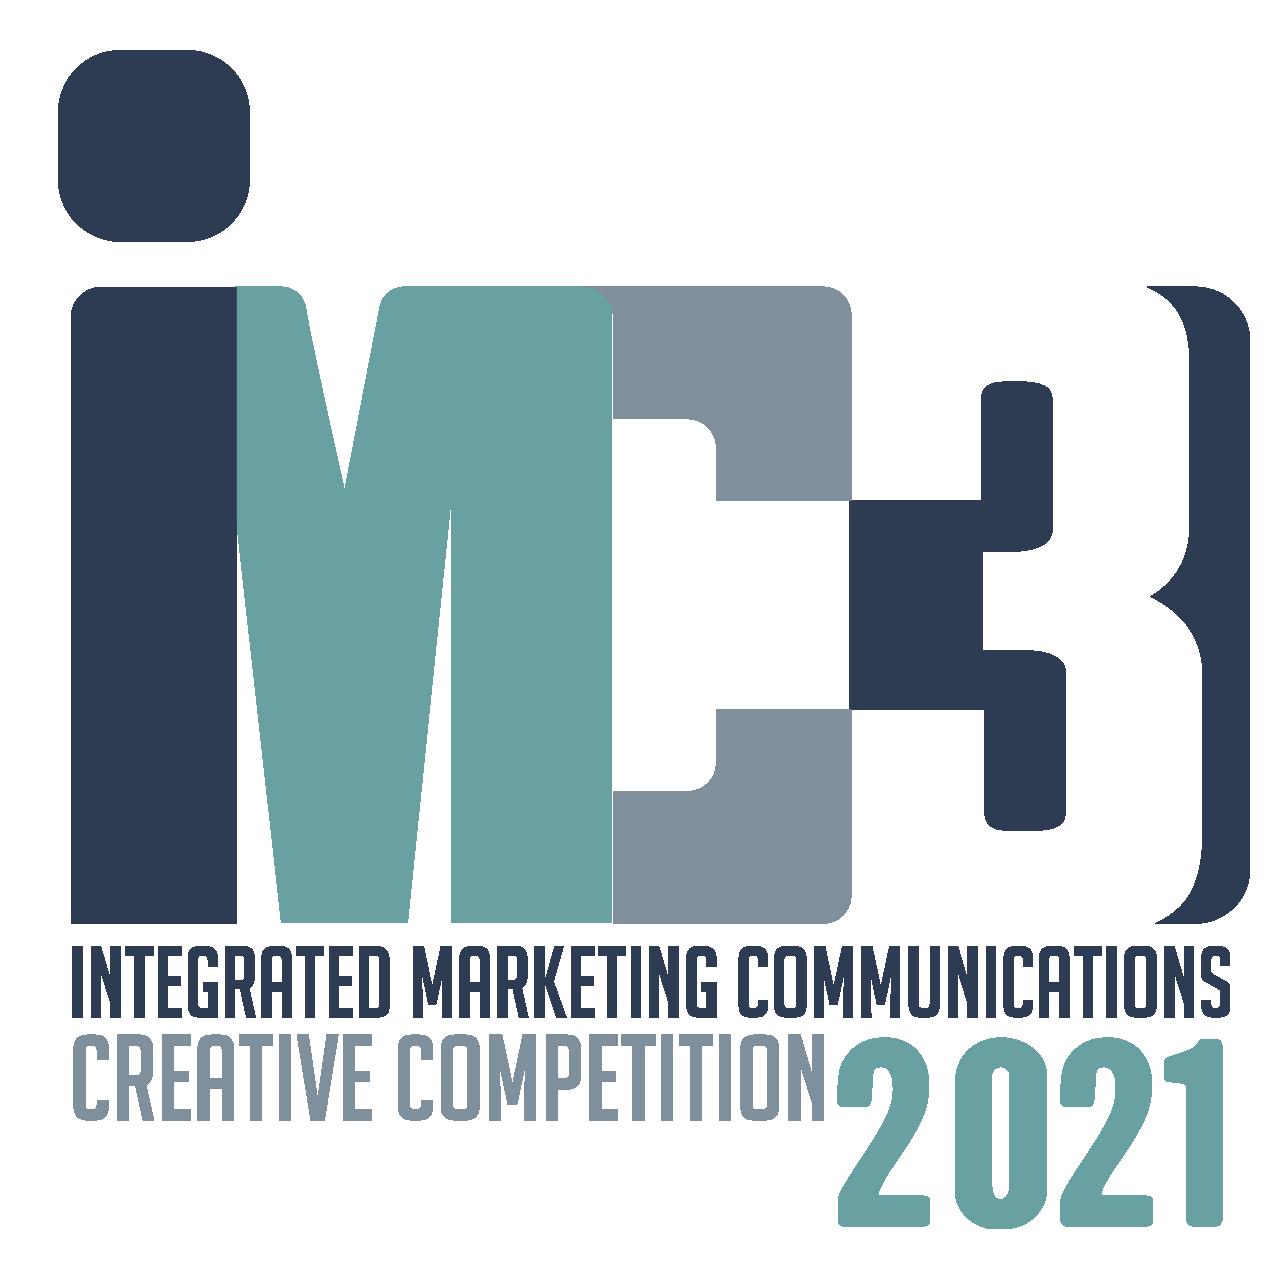 imc3.me